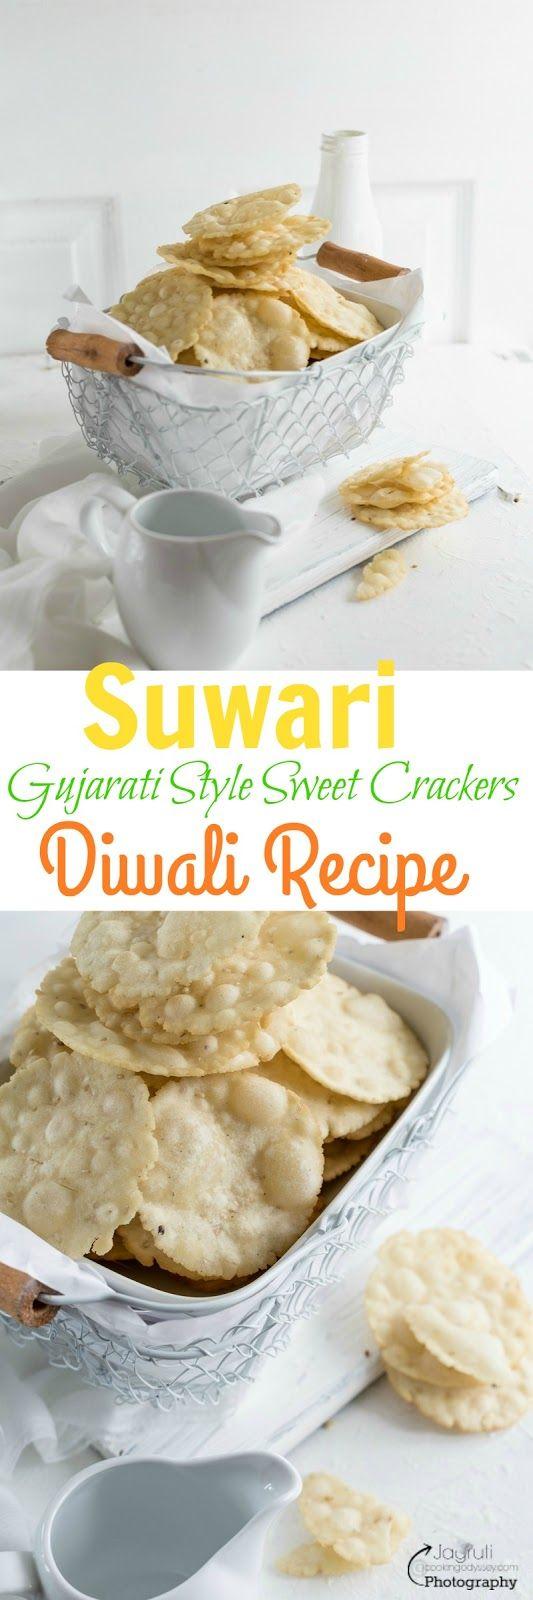 Jagruti's Cooking Odyssey: Suwari / Suvari - Gujarati style sweet and deep fried thin Crackers #Diwalicelebrations #Diwalisnacks #TraditionalIndiandiwalirecipes